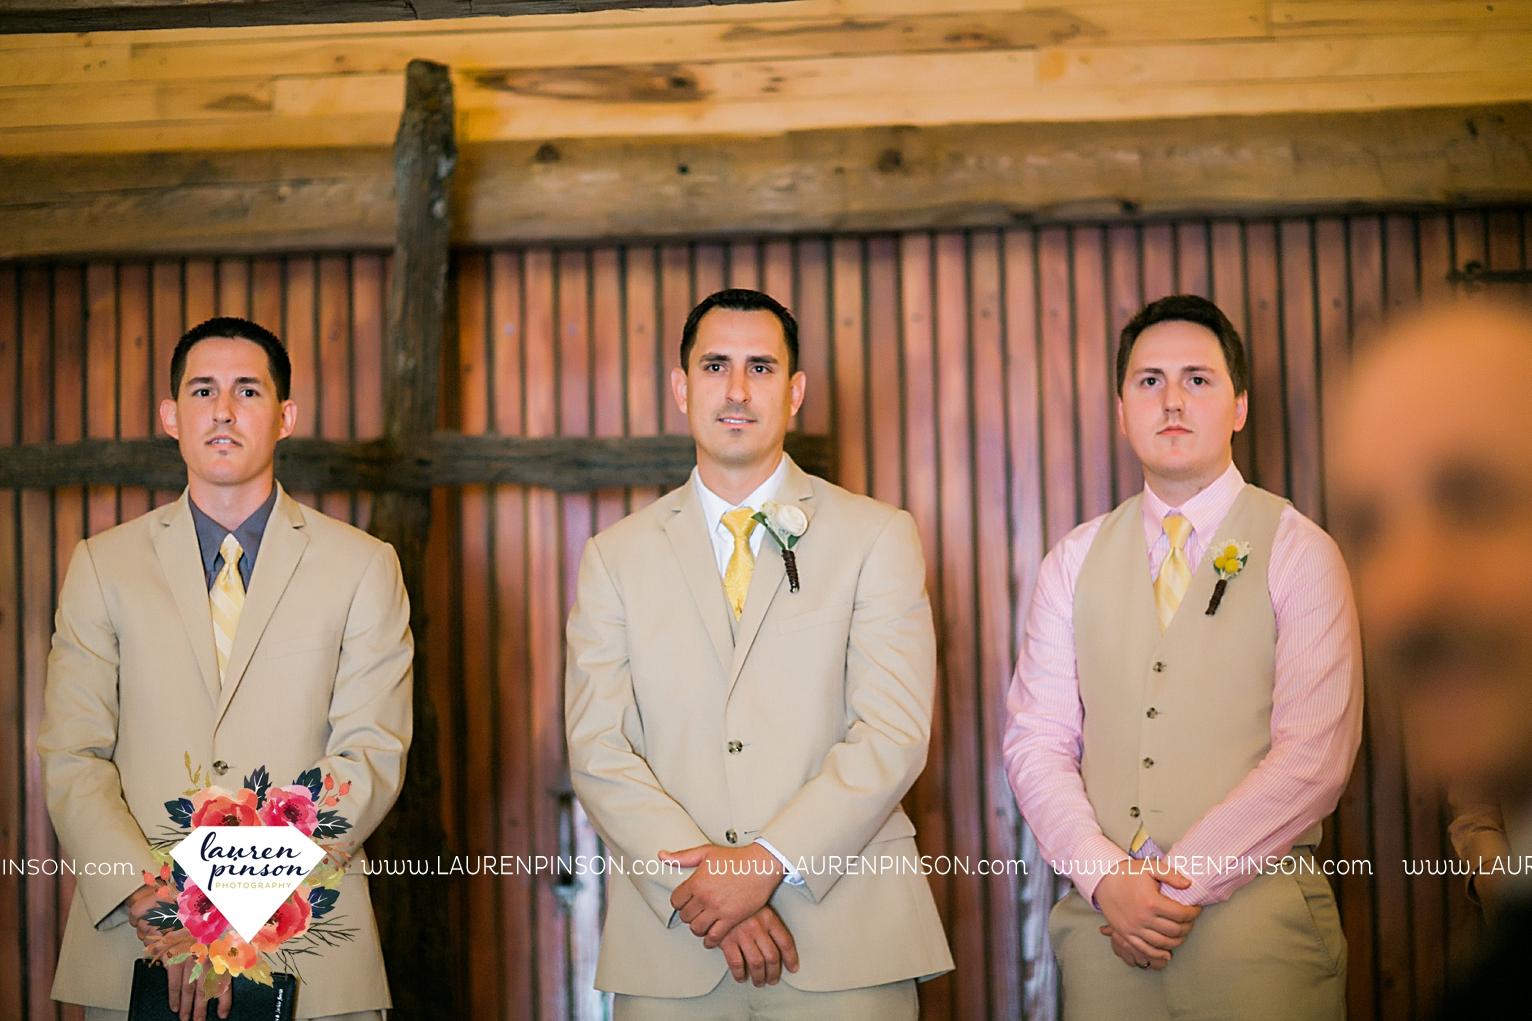 weatherford-texas-hollow-hill-farm-event-wedding-mineral-wells-dfw-wedding-photographer-wichita-falls-photography_3158.jpg